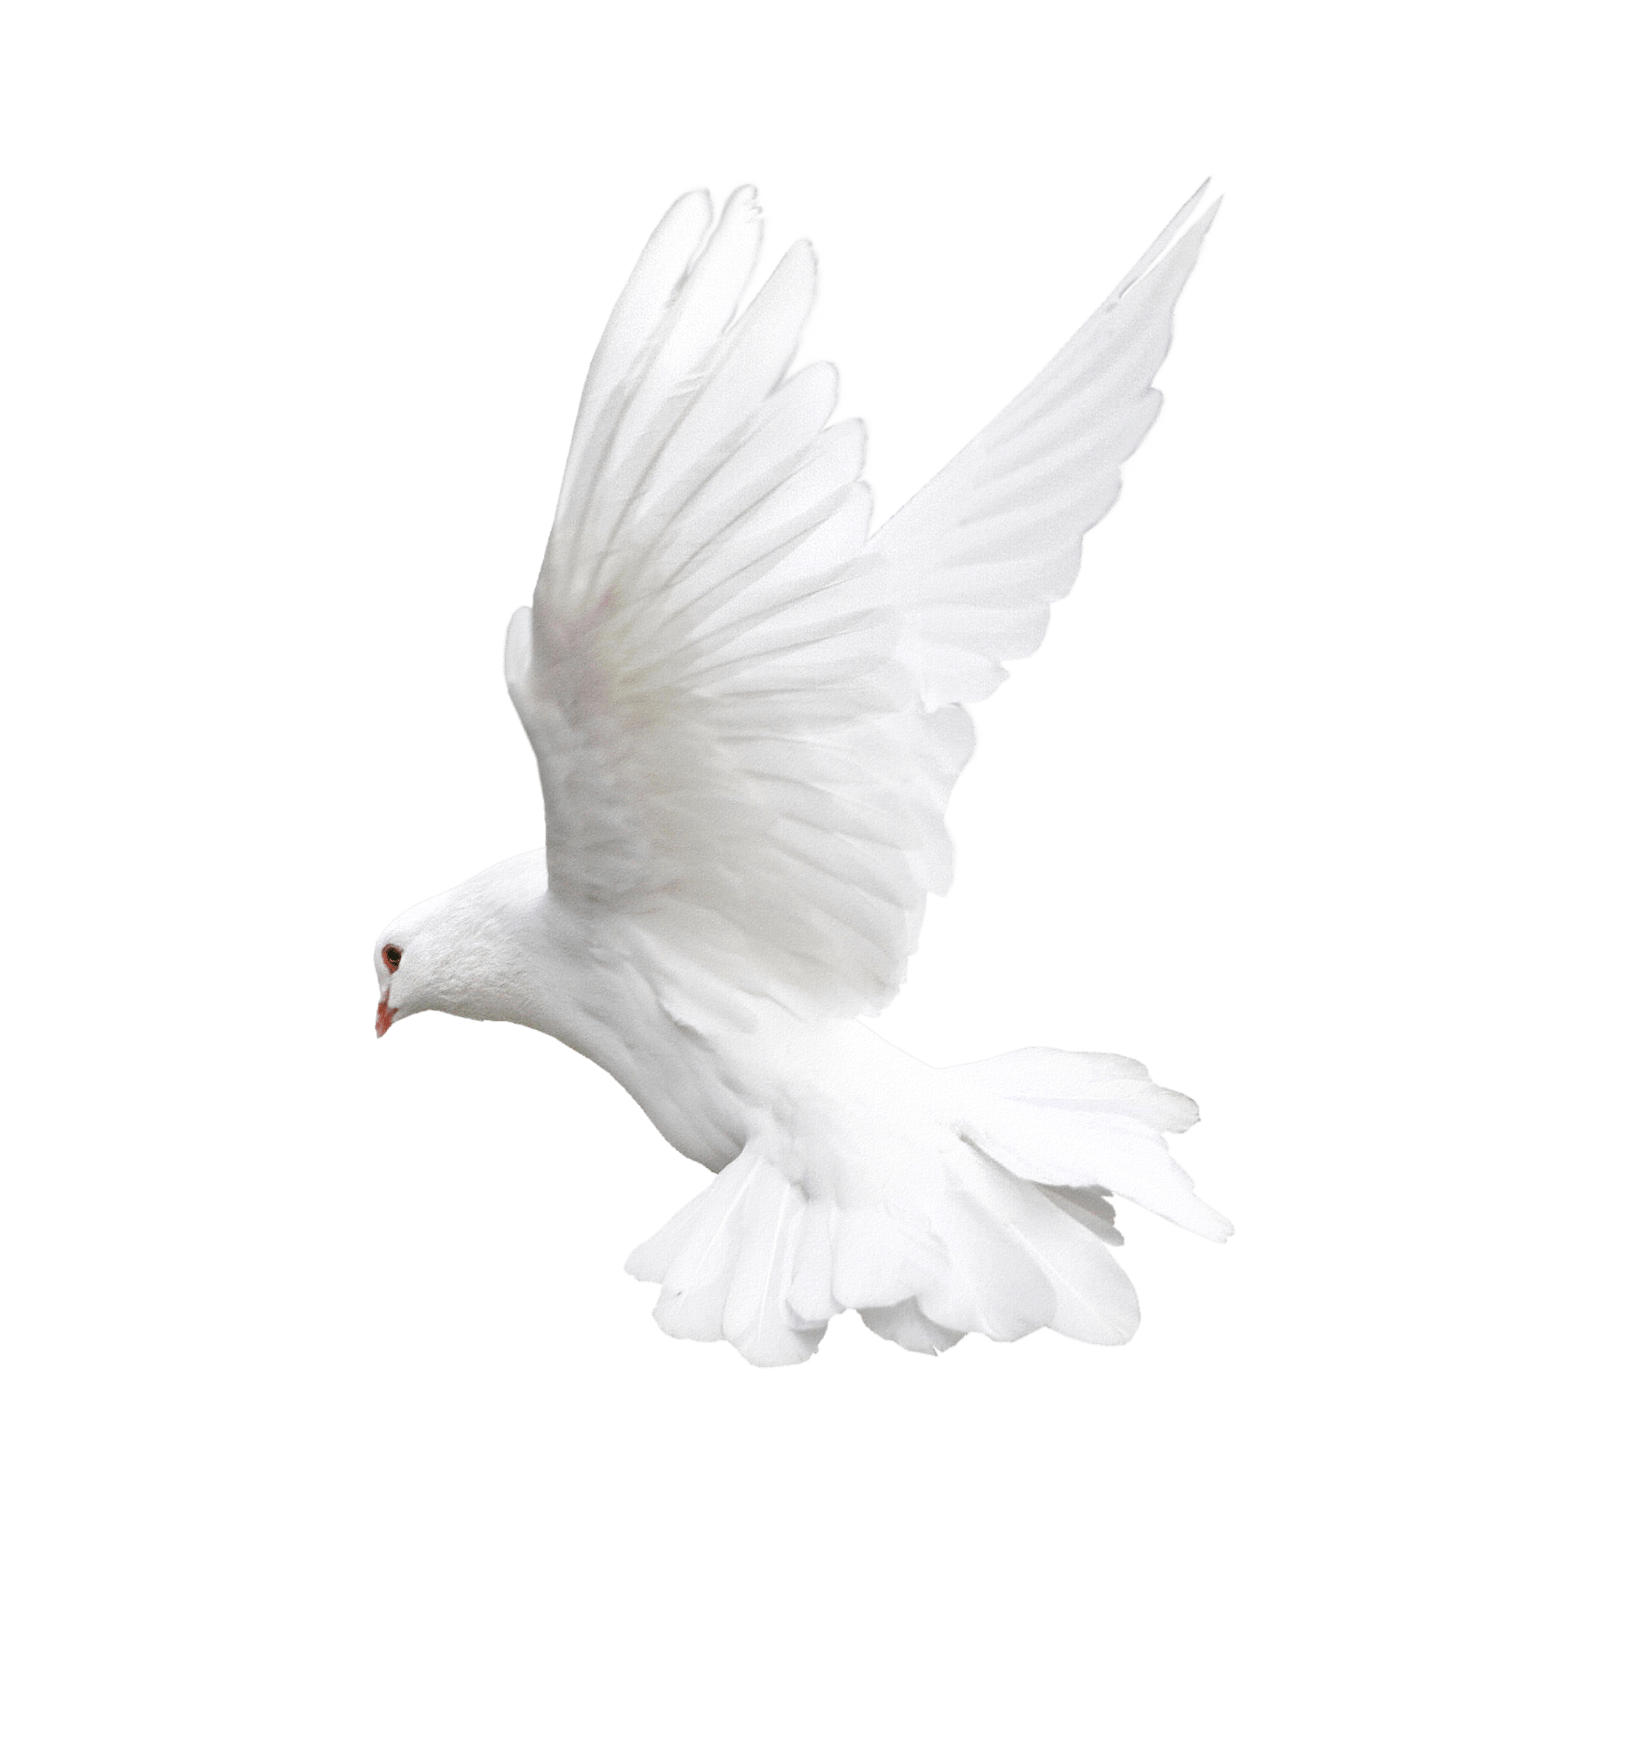 Pigeon PNG - 771